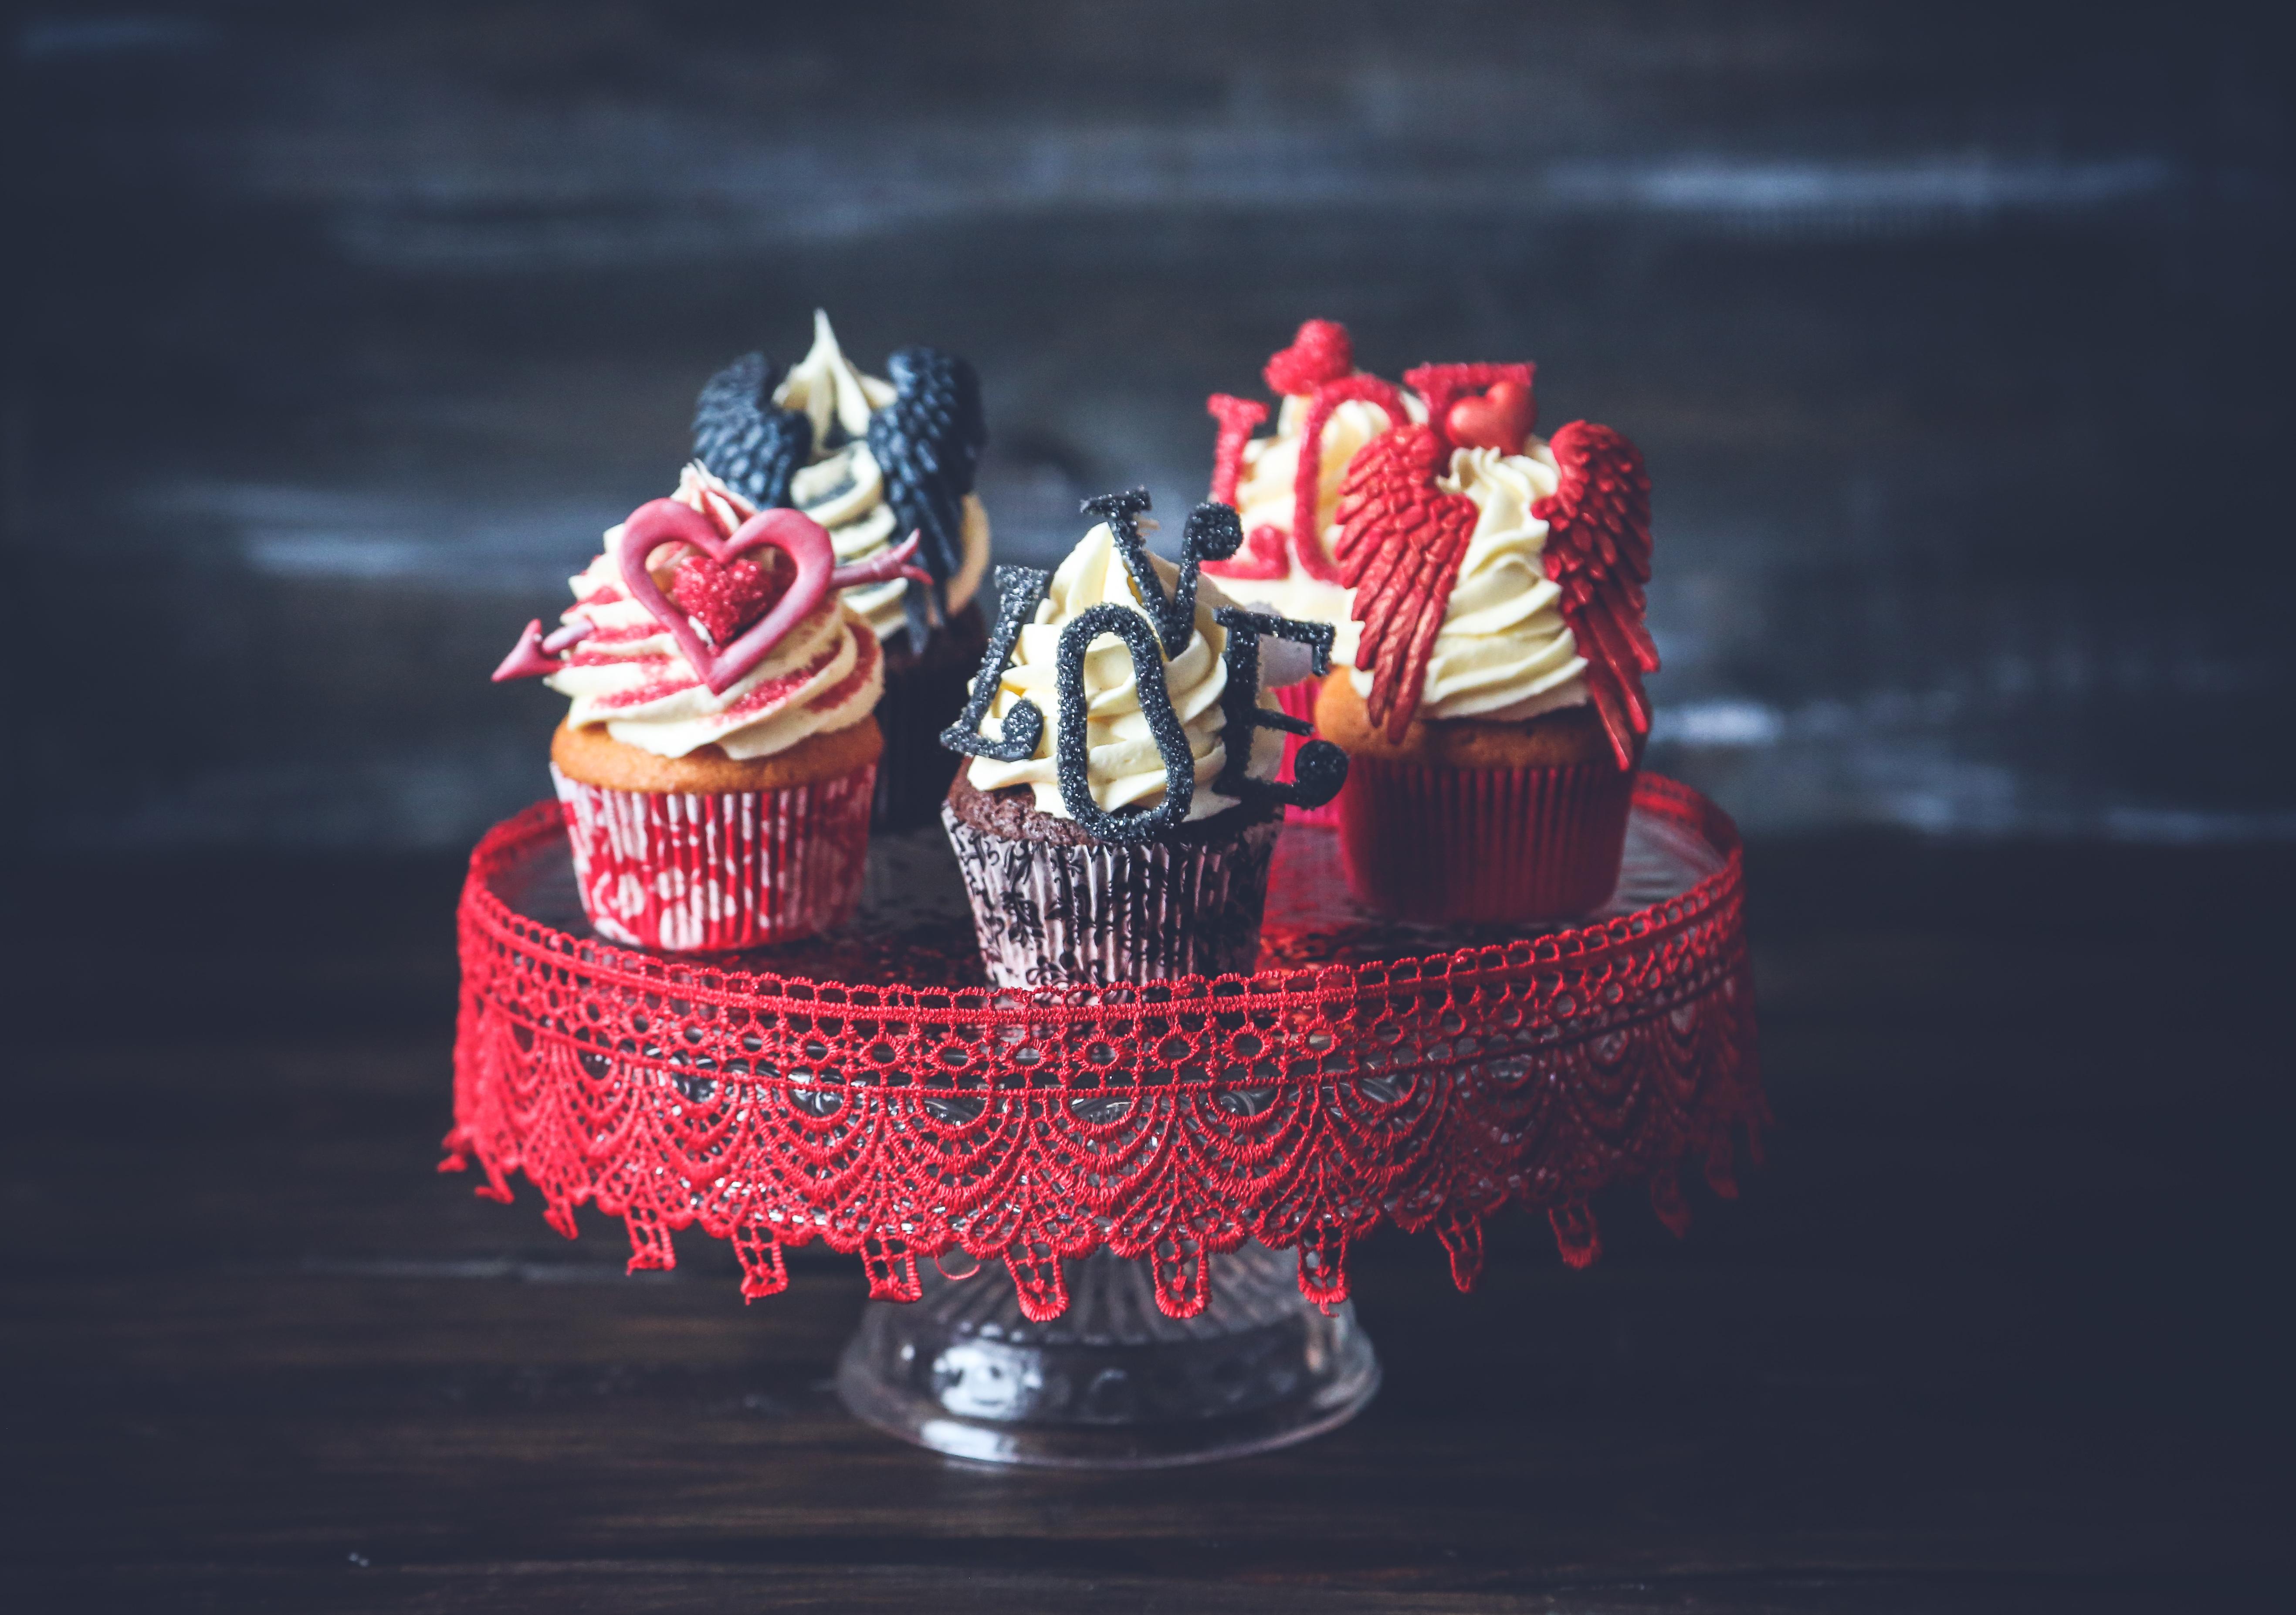 Cupcake story 2